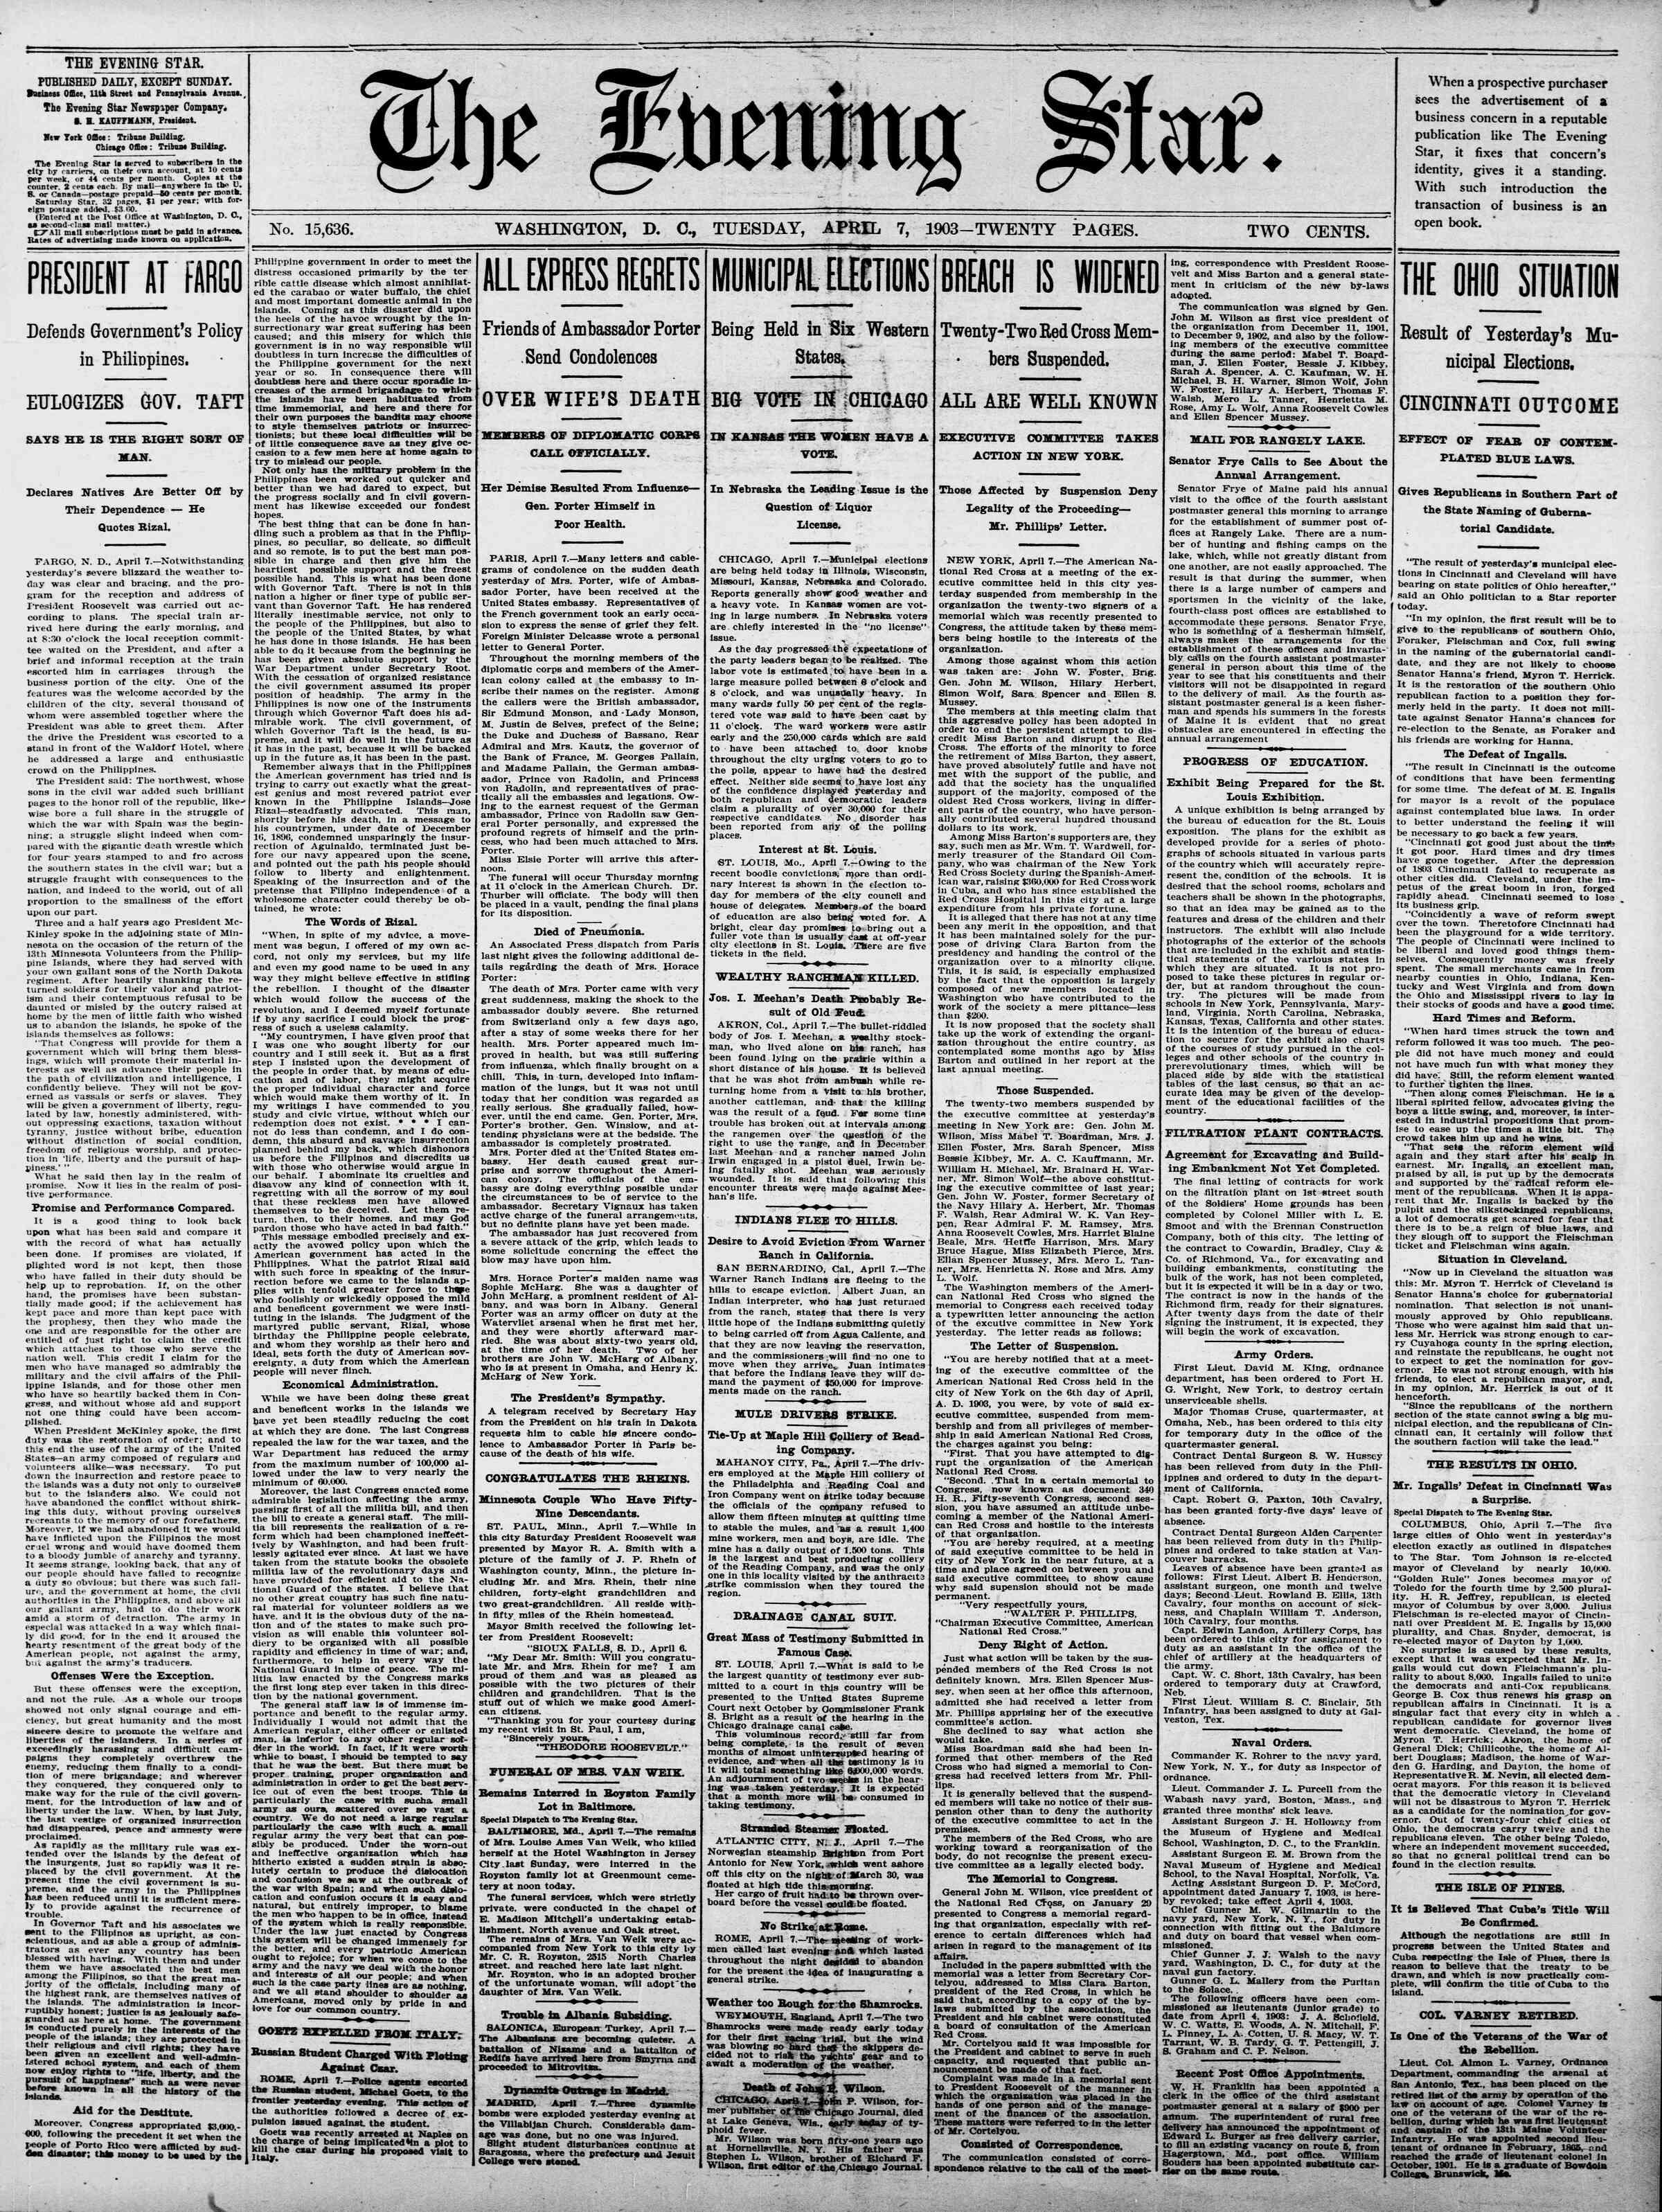 7 Nisan 1903 Tarihli Evening Star Gazetesi Sayfa 1